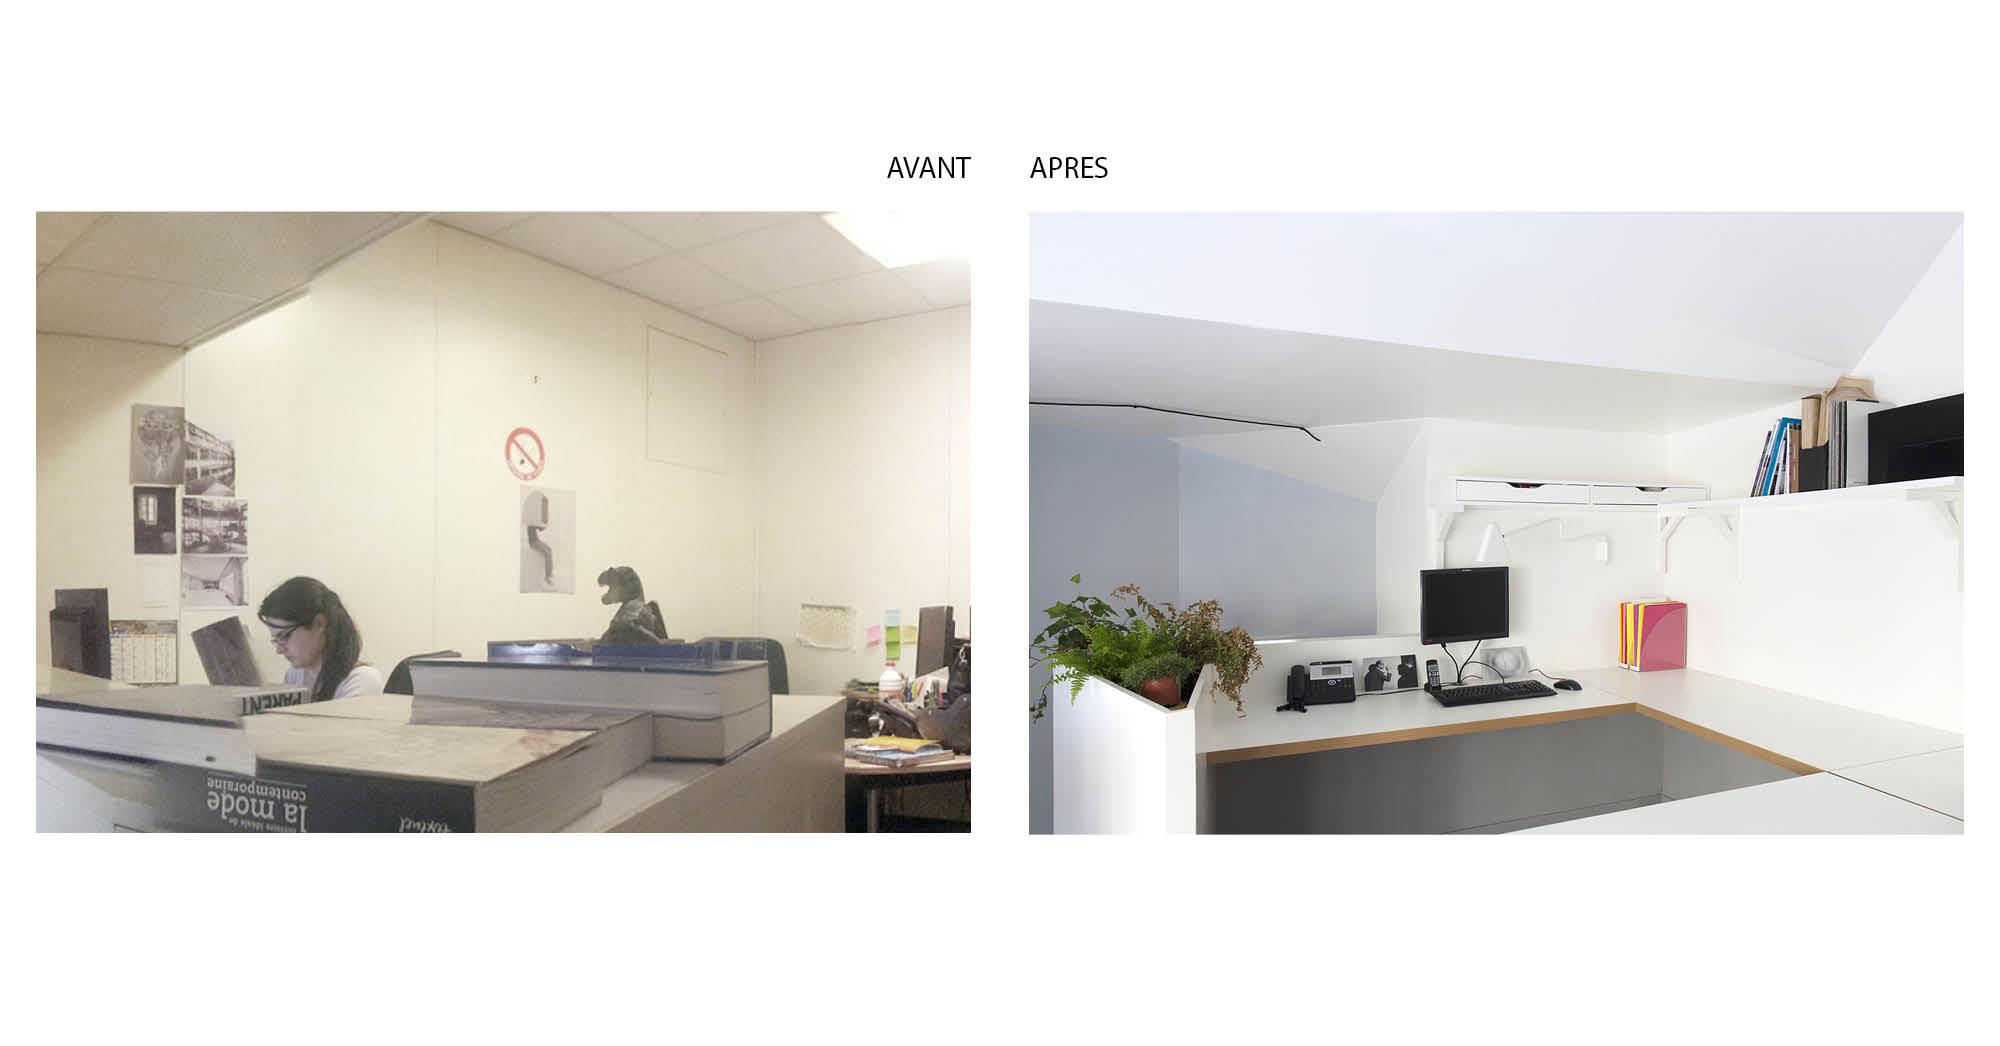 bureaux du personnel galerie des galeries aba workshop. Black Bedroom Furniture Sets. Home Design Ideas